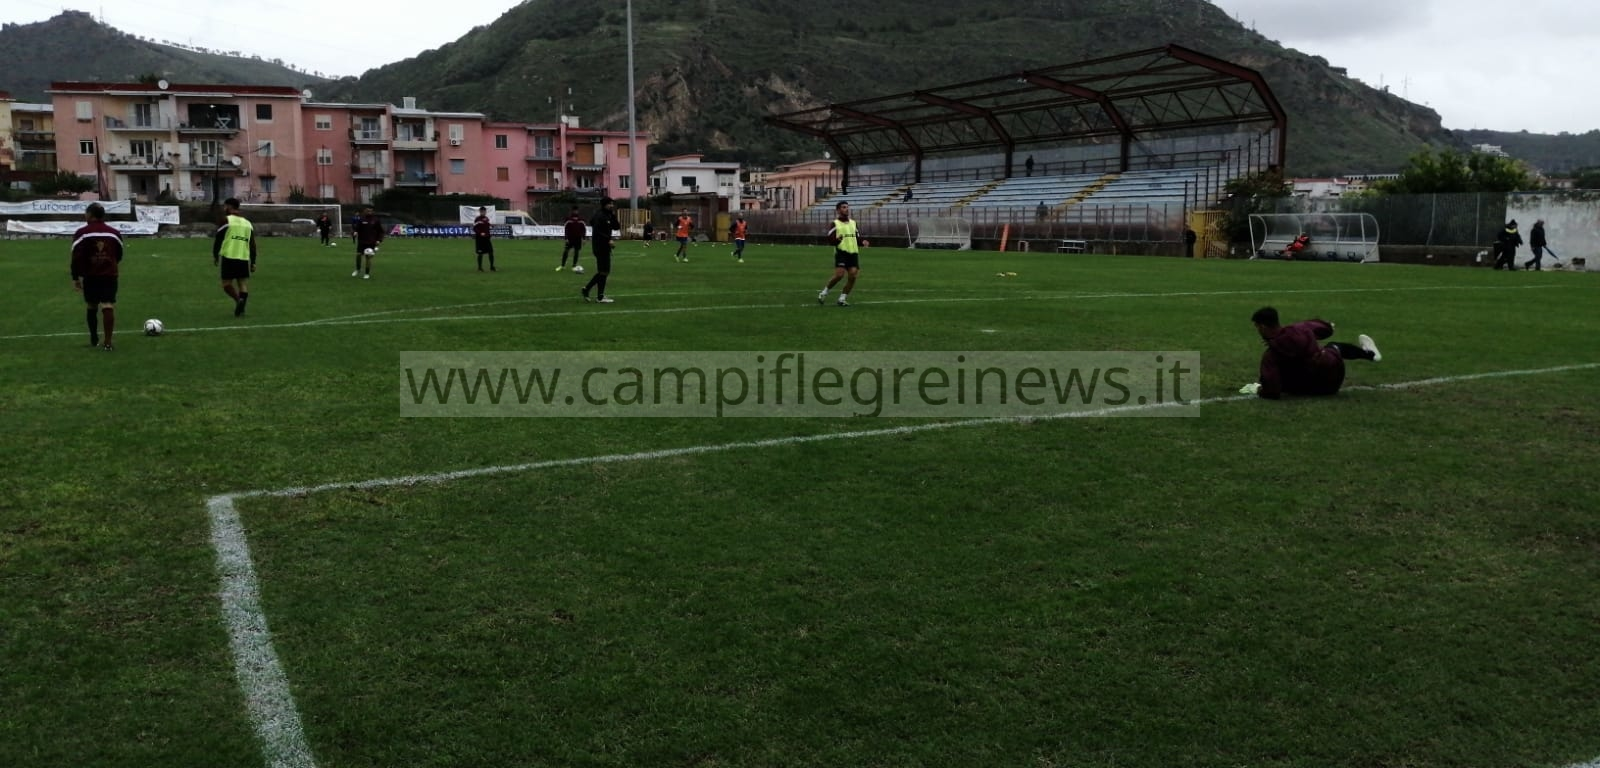 Diretta Goal Flegrei Segui Live Il Derby Puteolana Sibilla Foto Live Campi Flegrei News